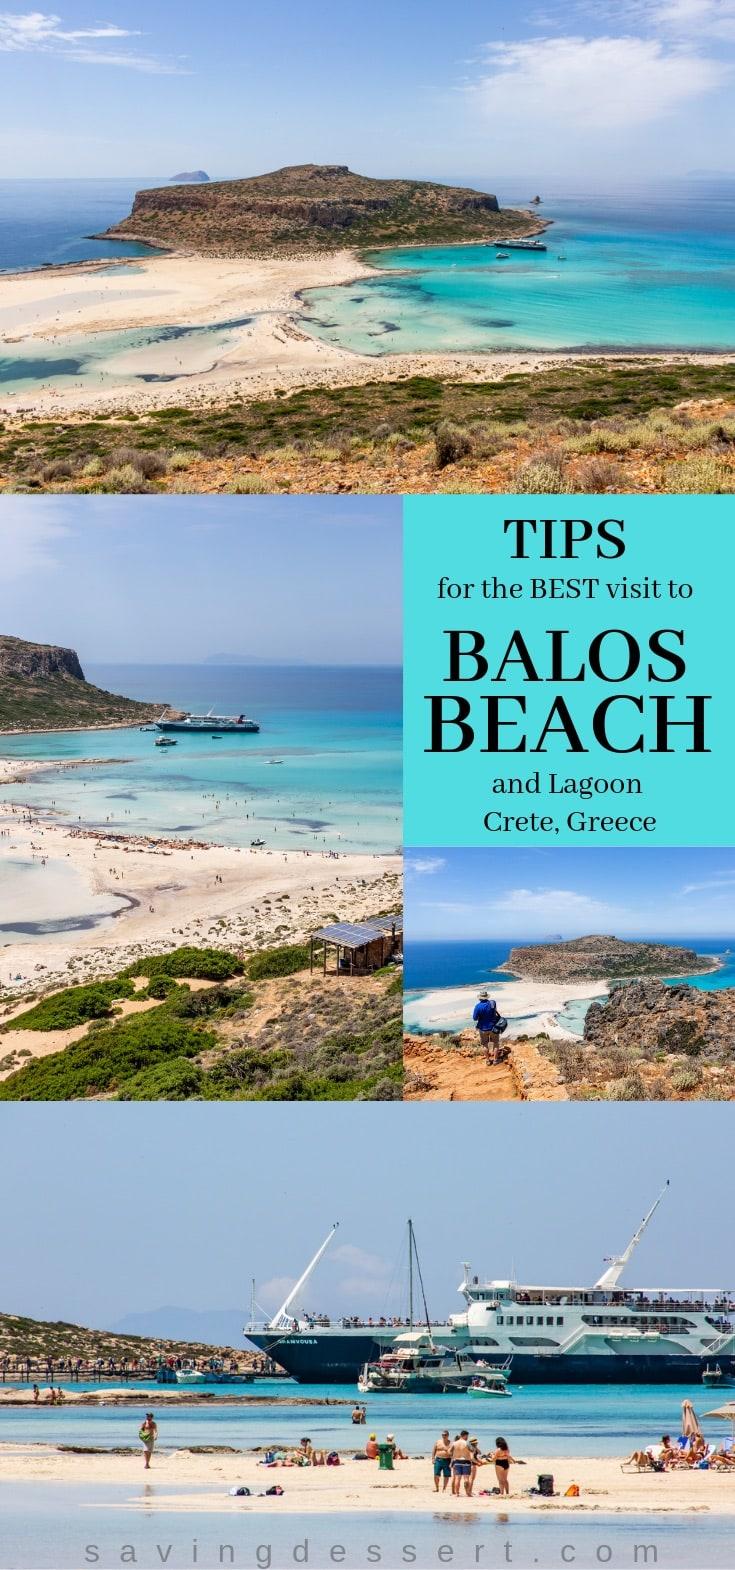 Photos from Balos Beach